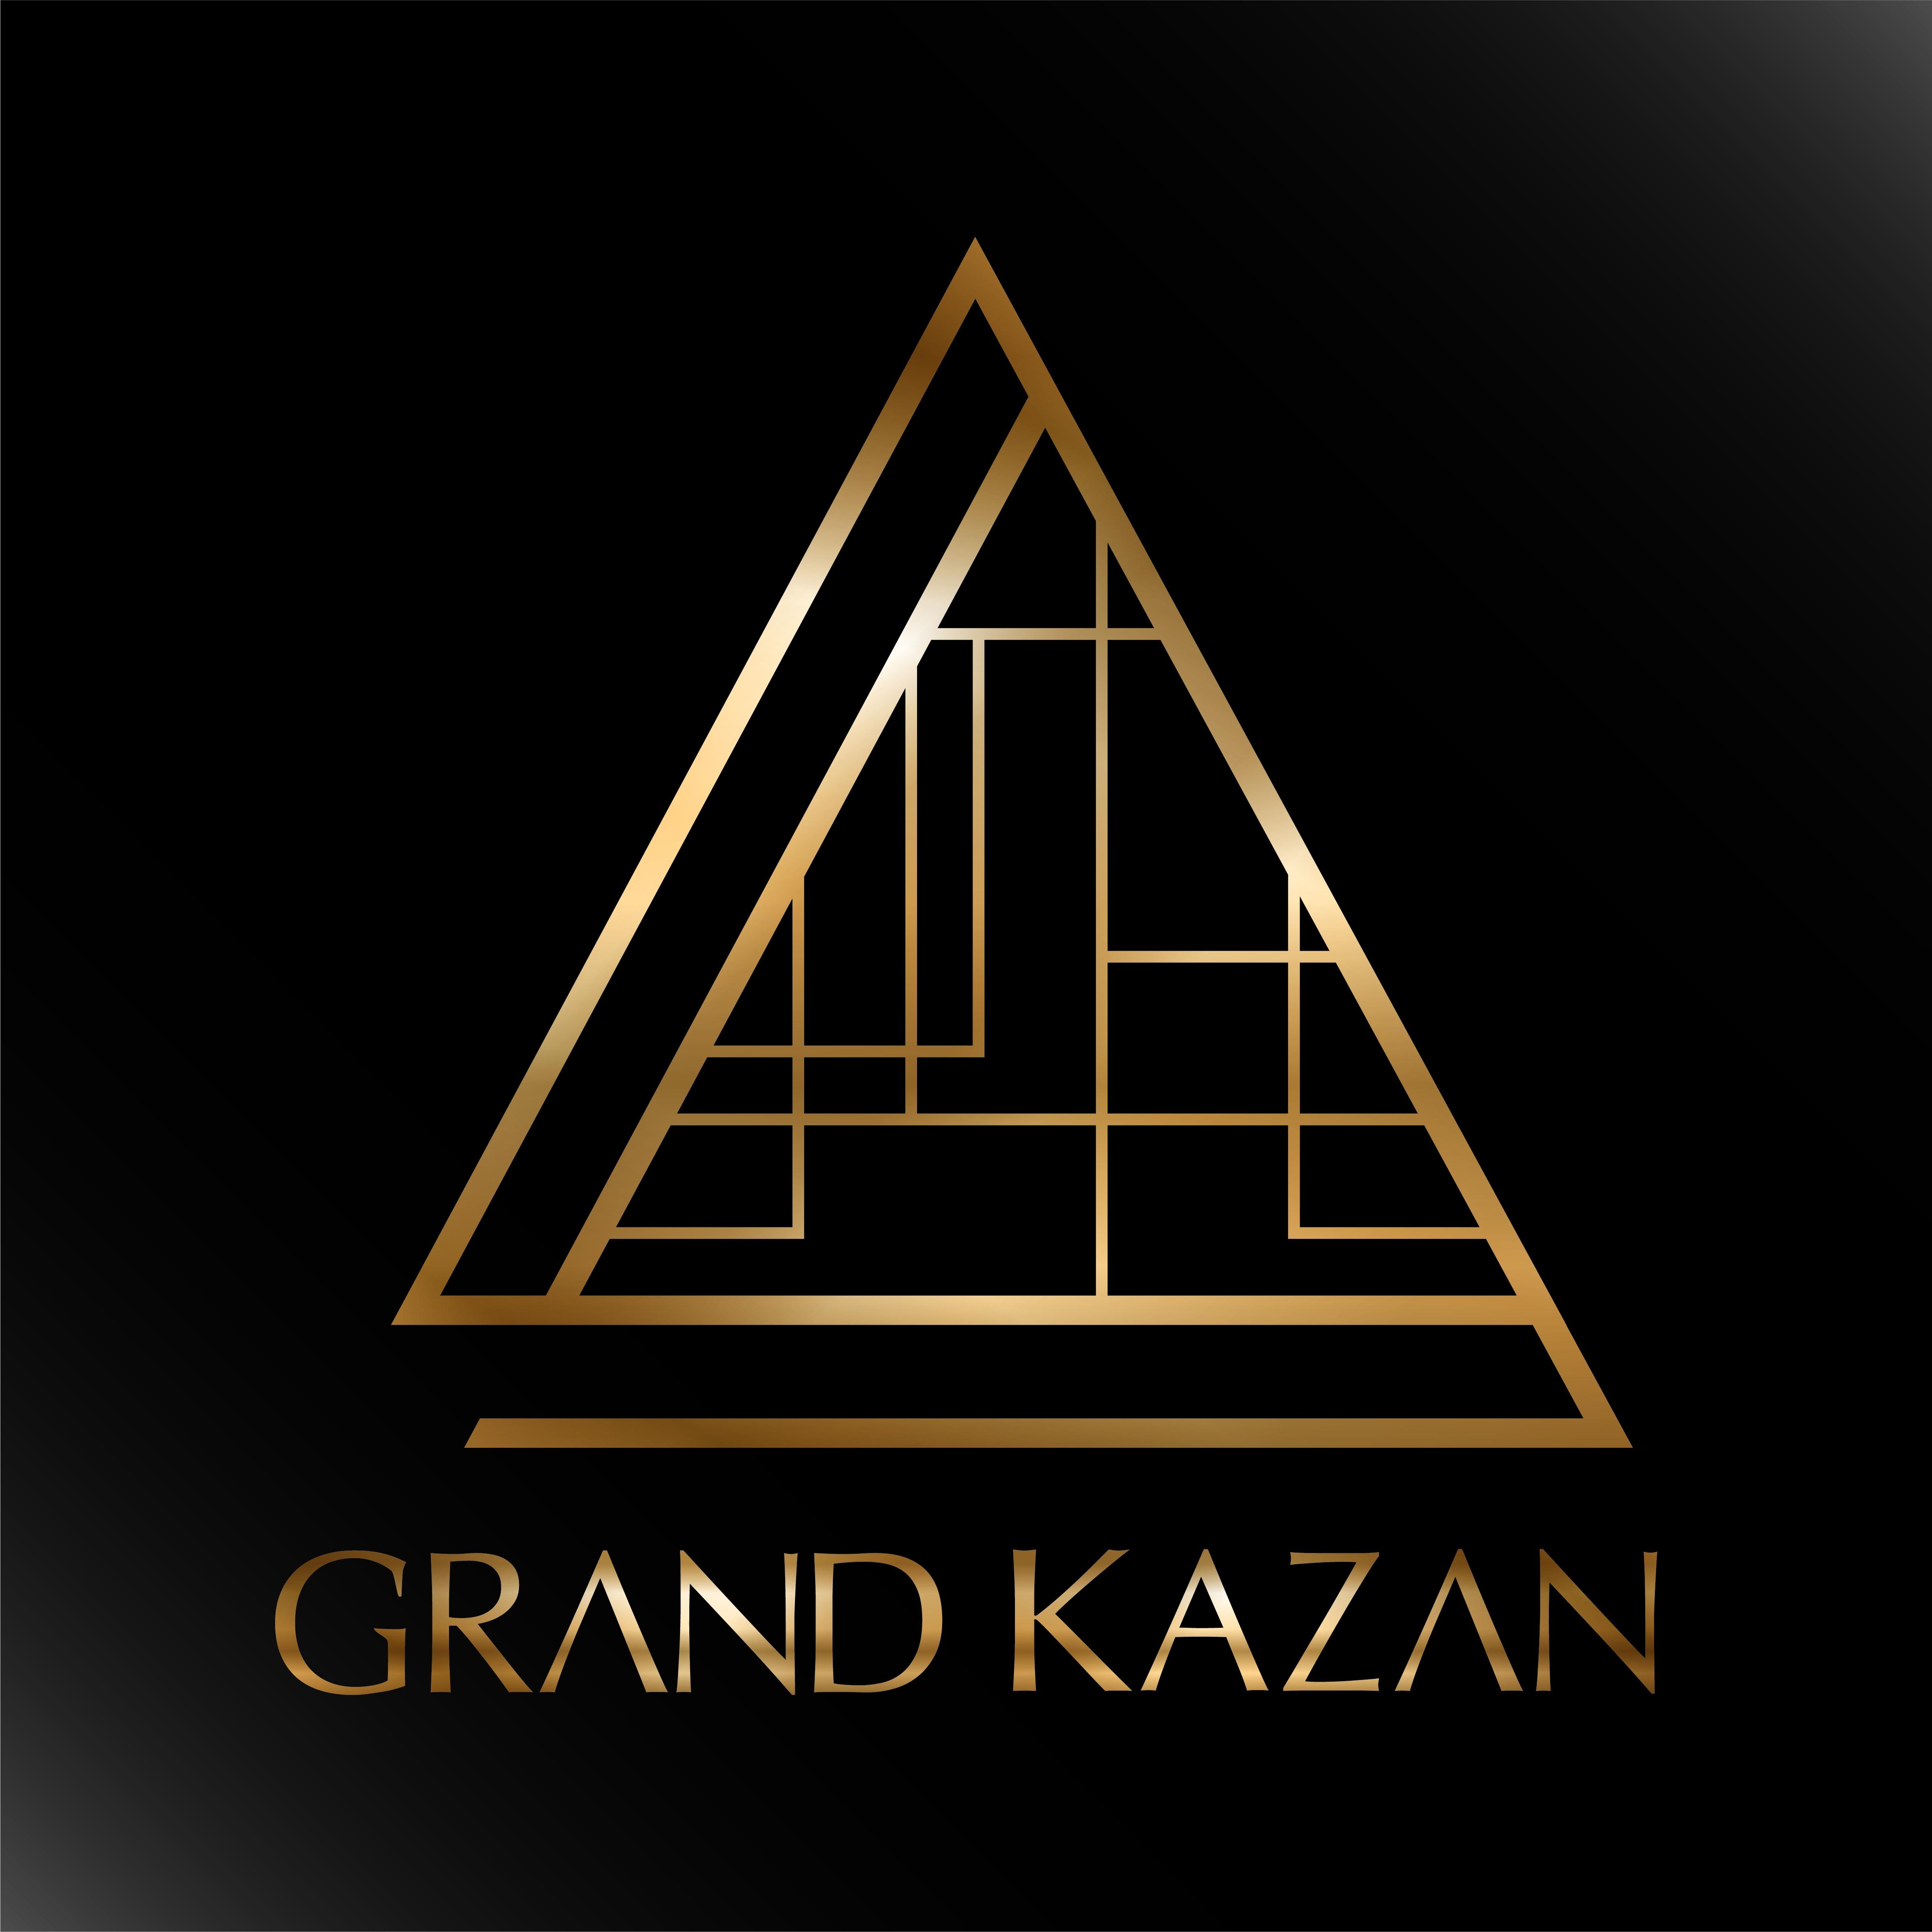 『GRAND KAZAN』グランドオープン!!